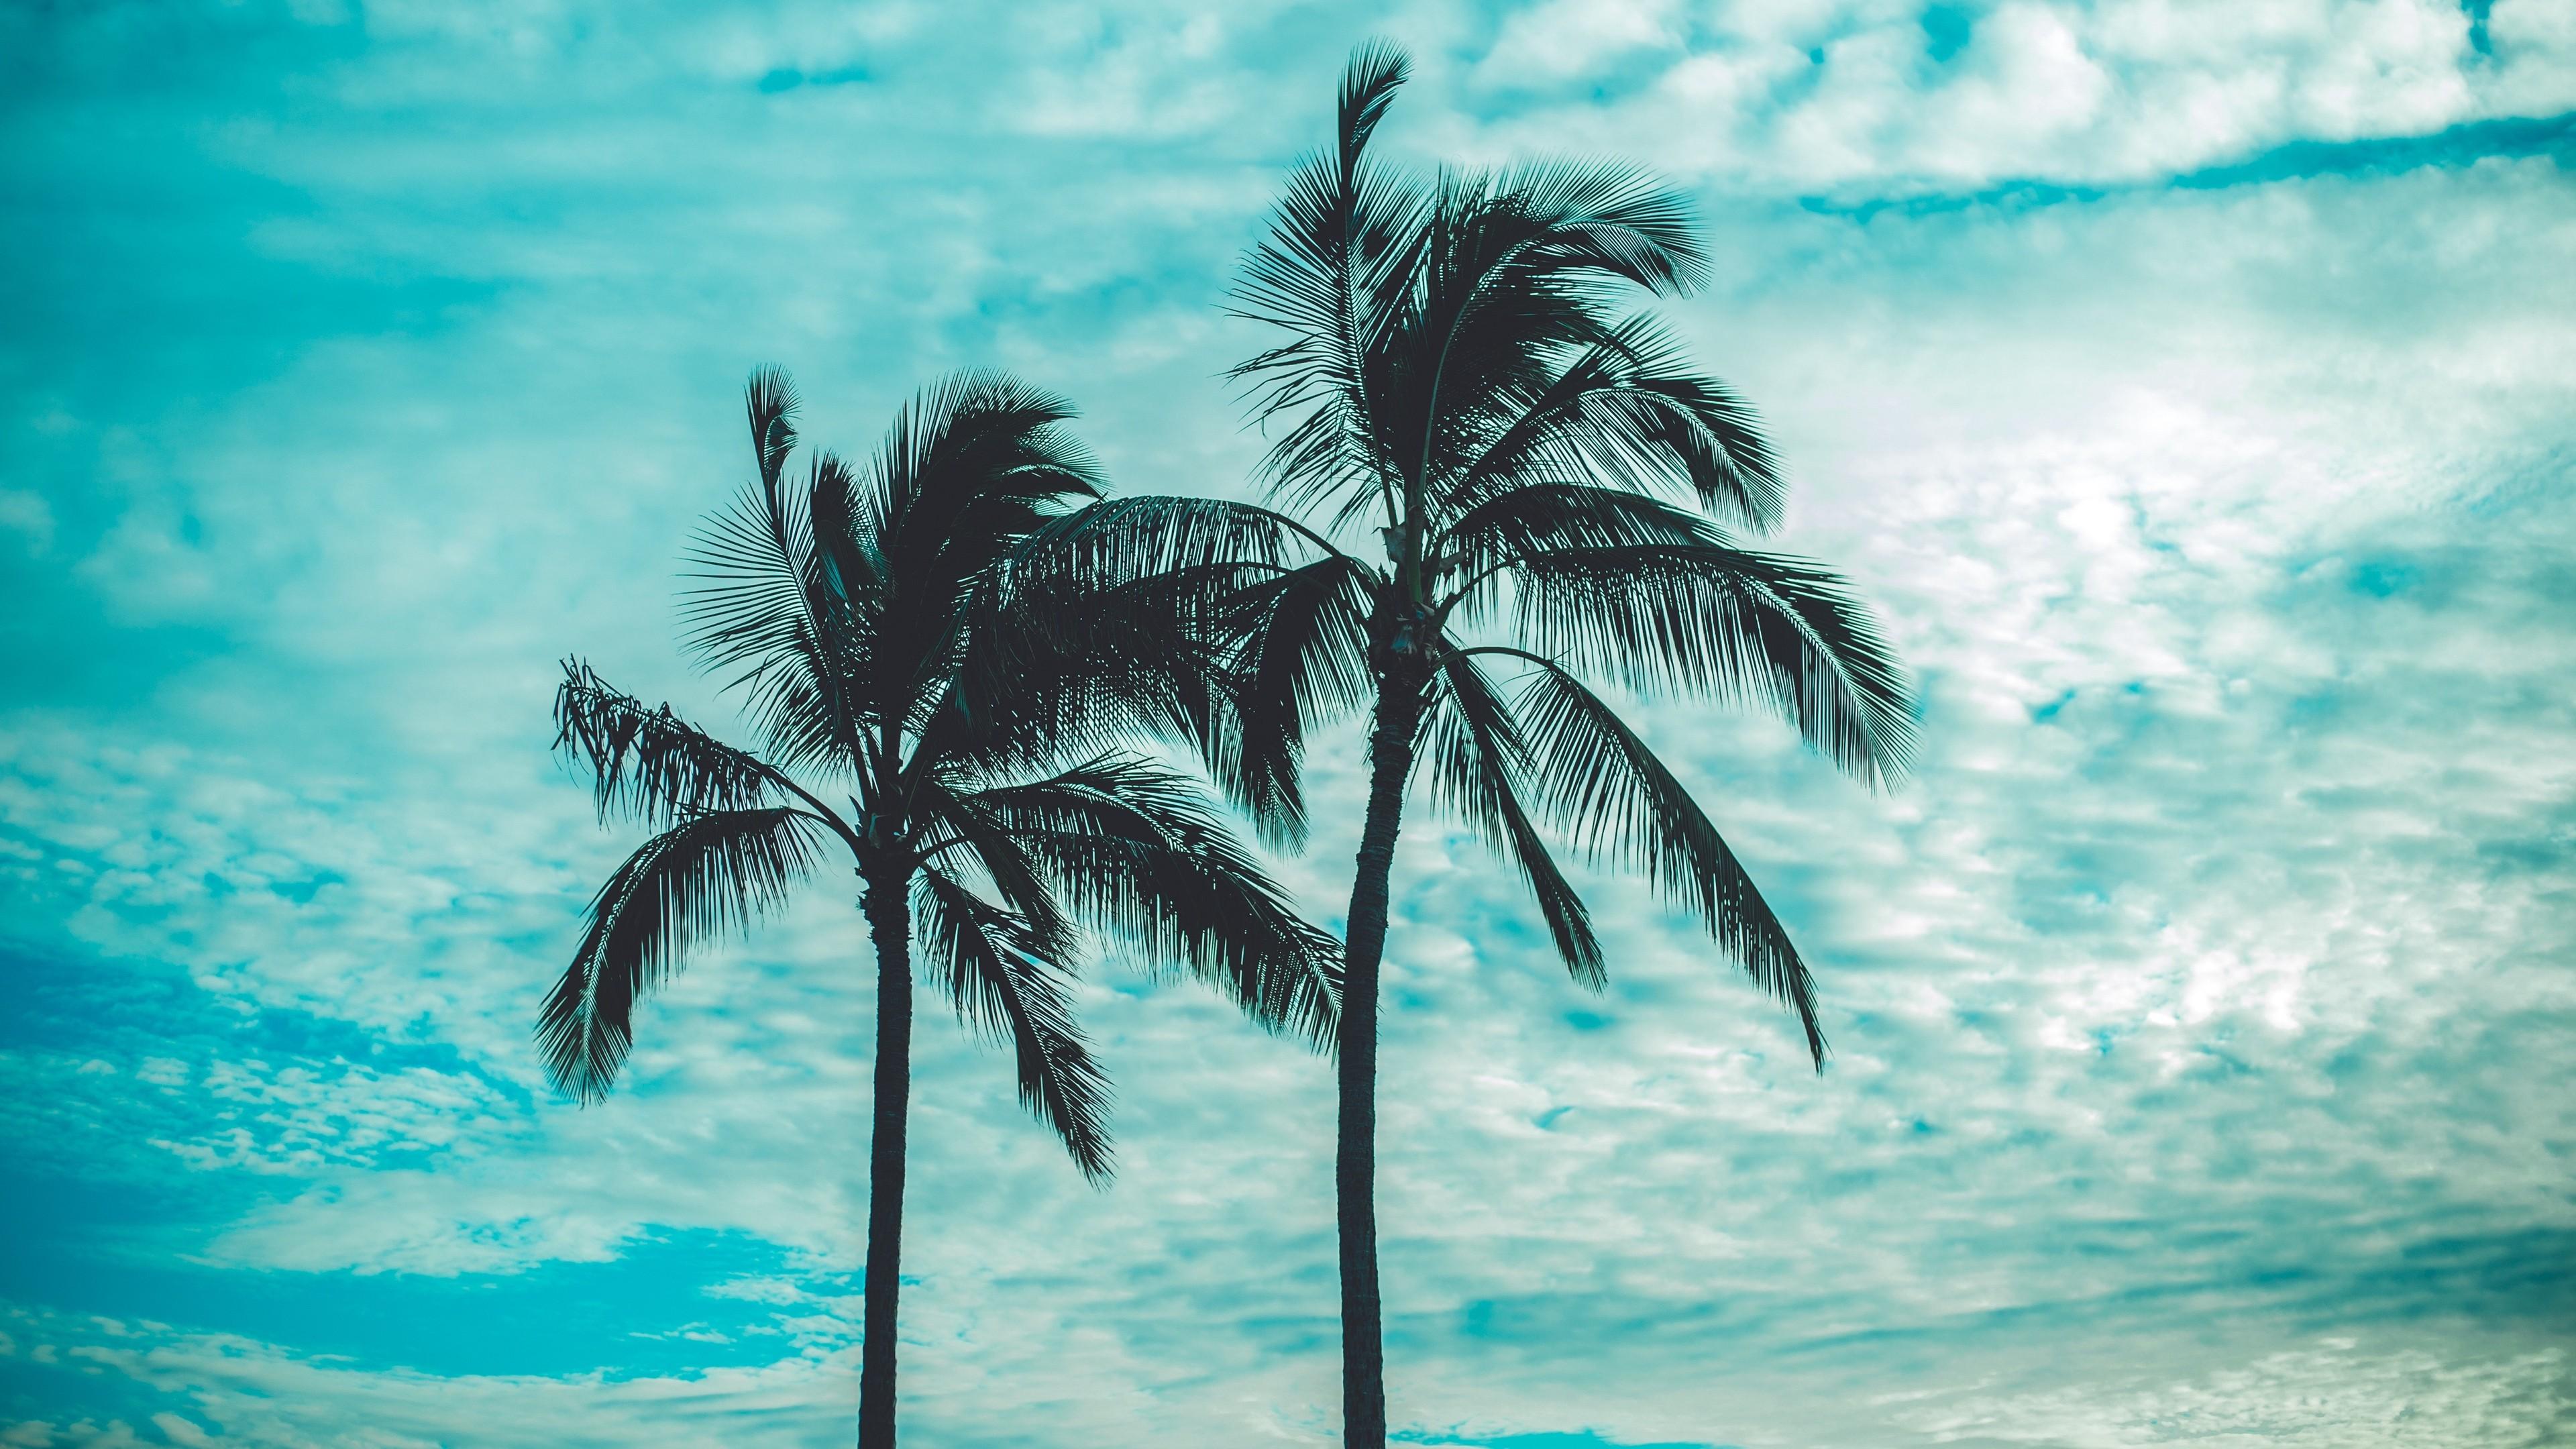 Palm Trees 4k - HD Wallpaper